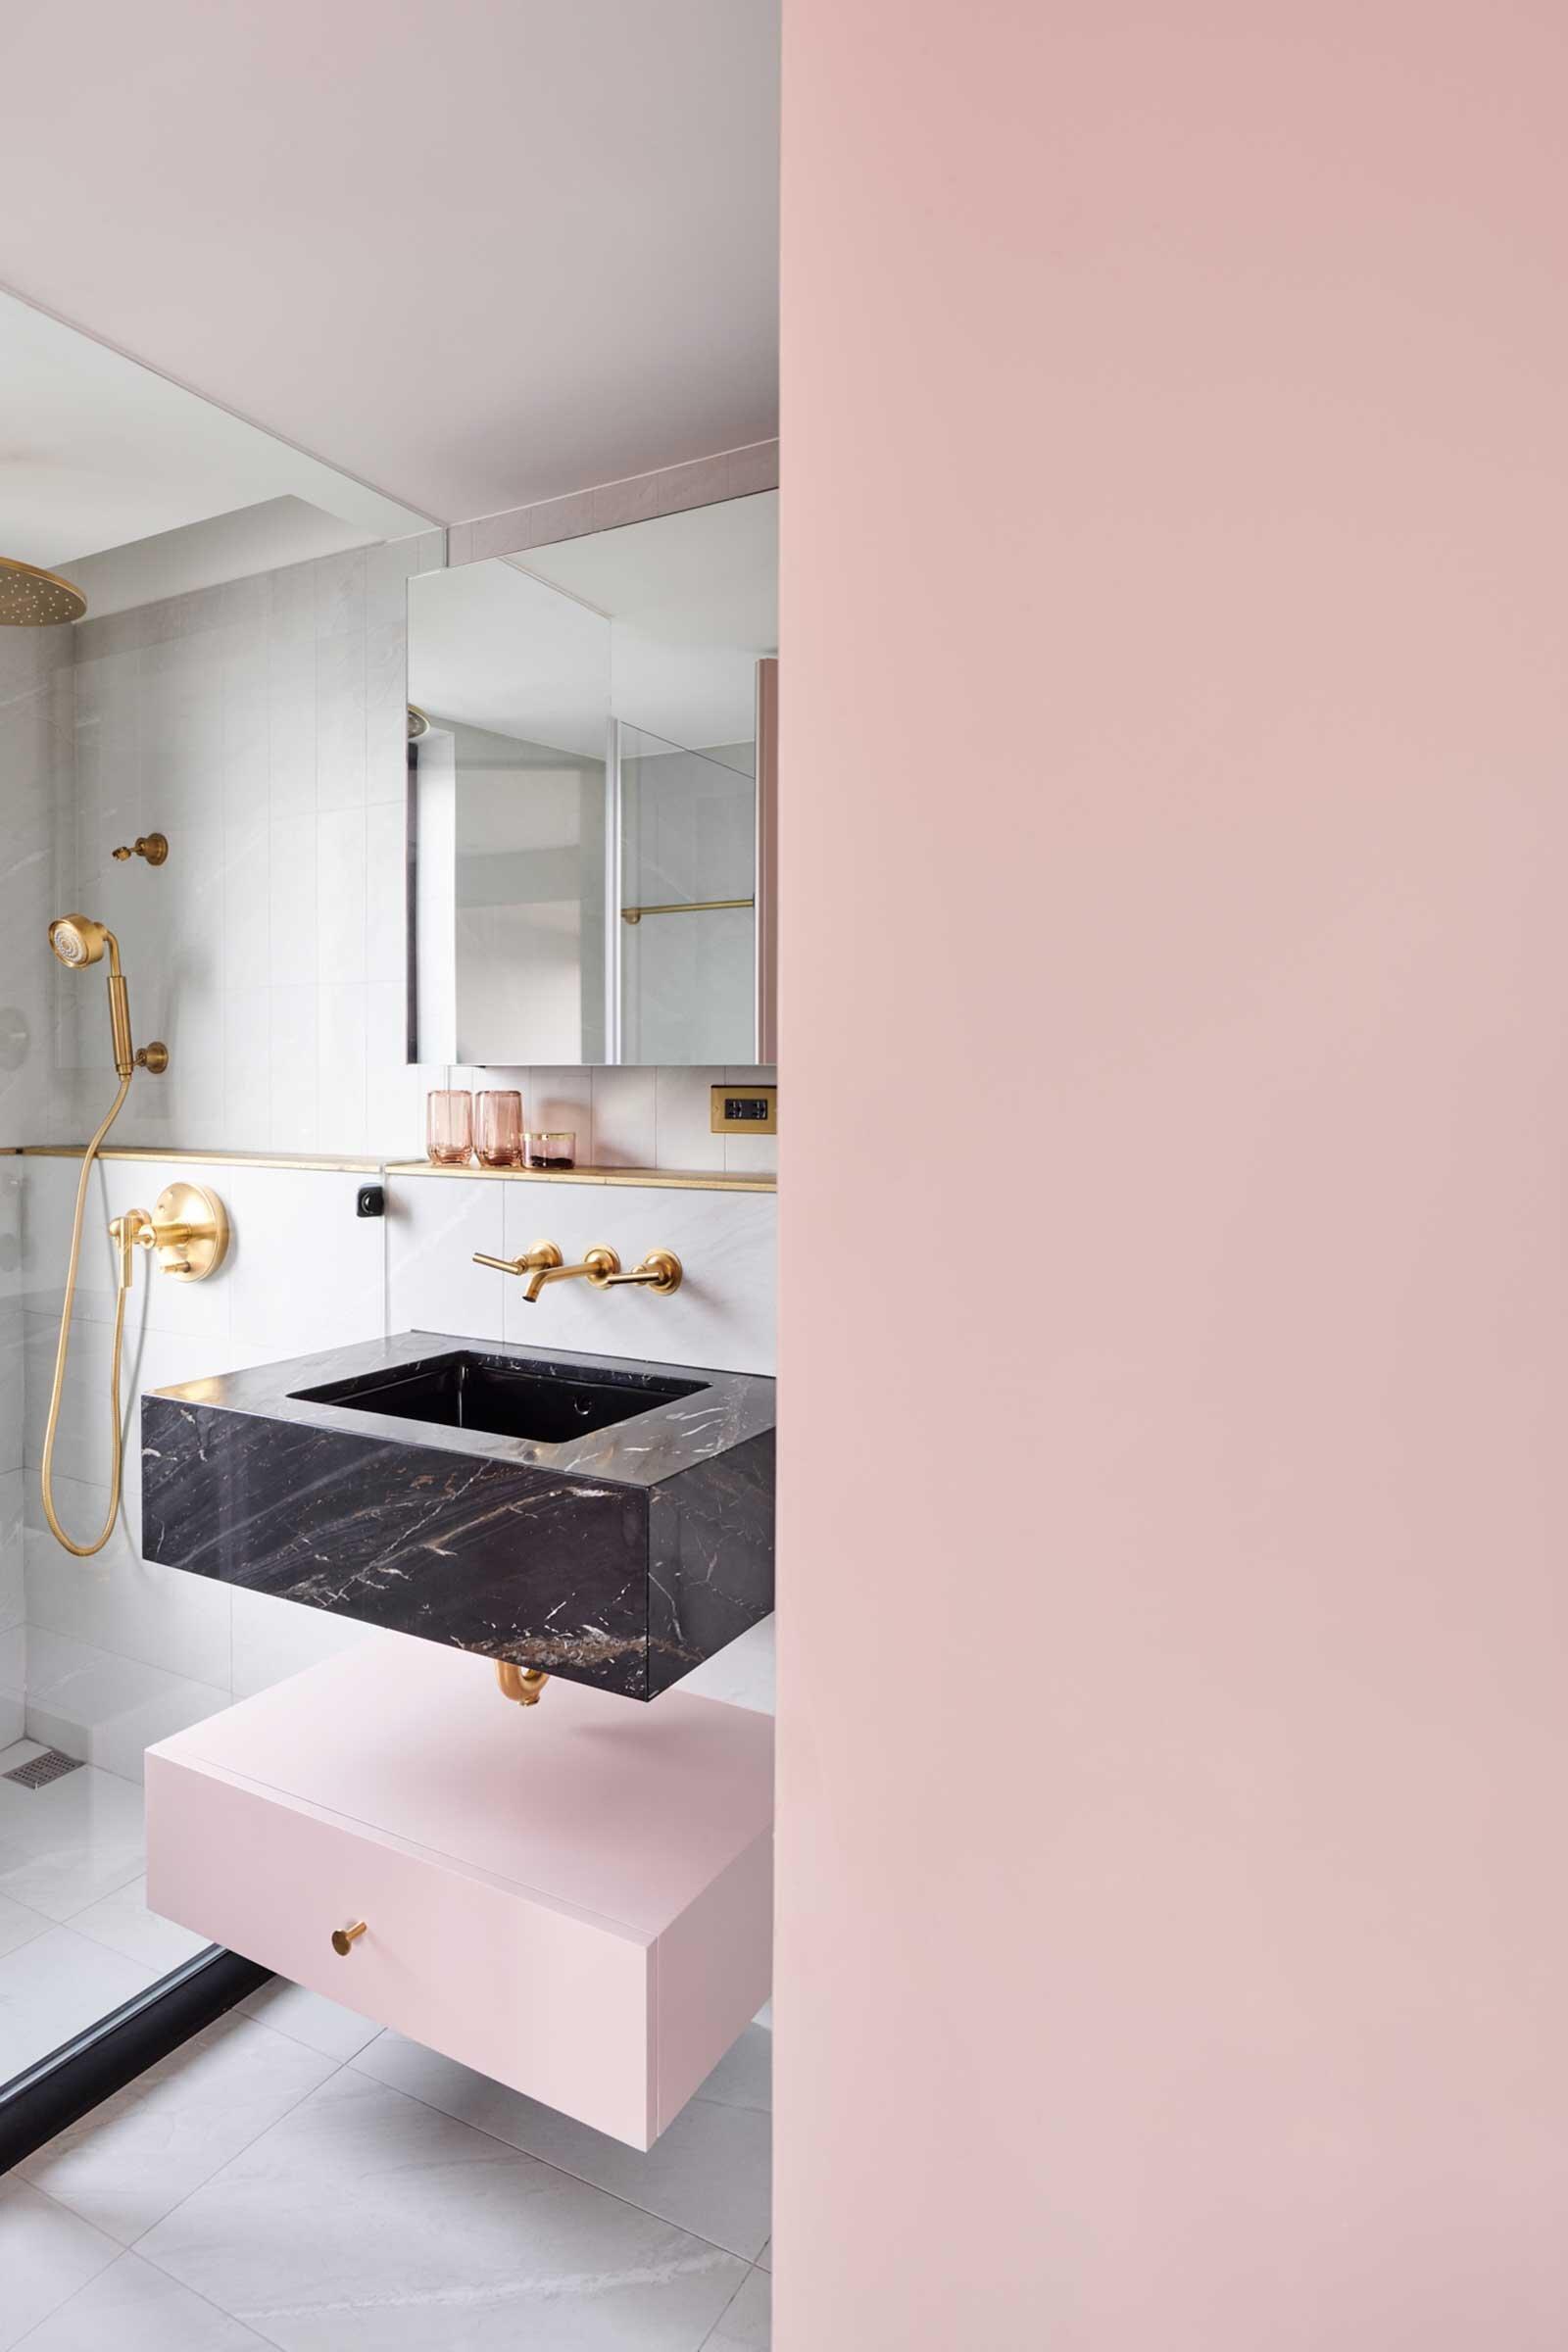 Chen-Studio-Yi-Hsiang-Chao-Architects_DSC0952@0,25x.jpg